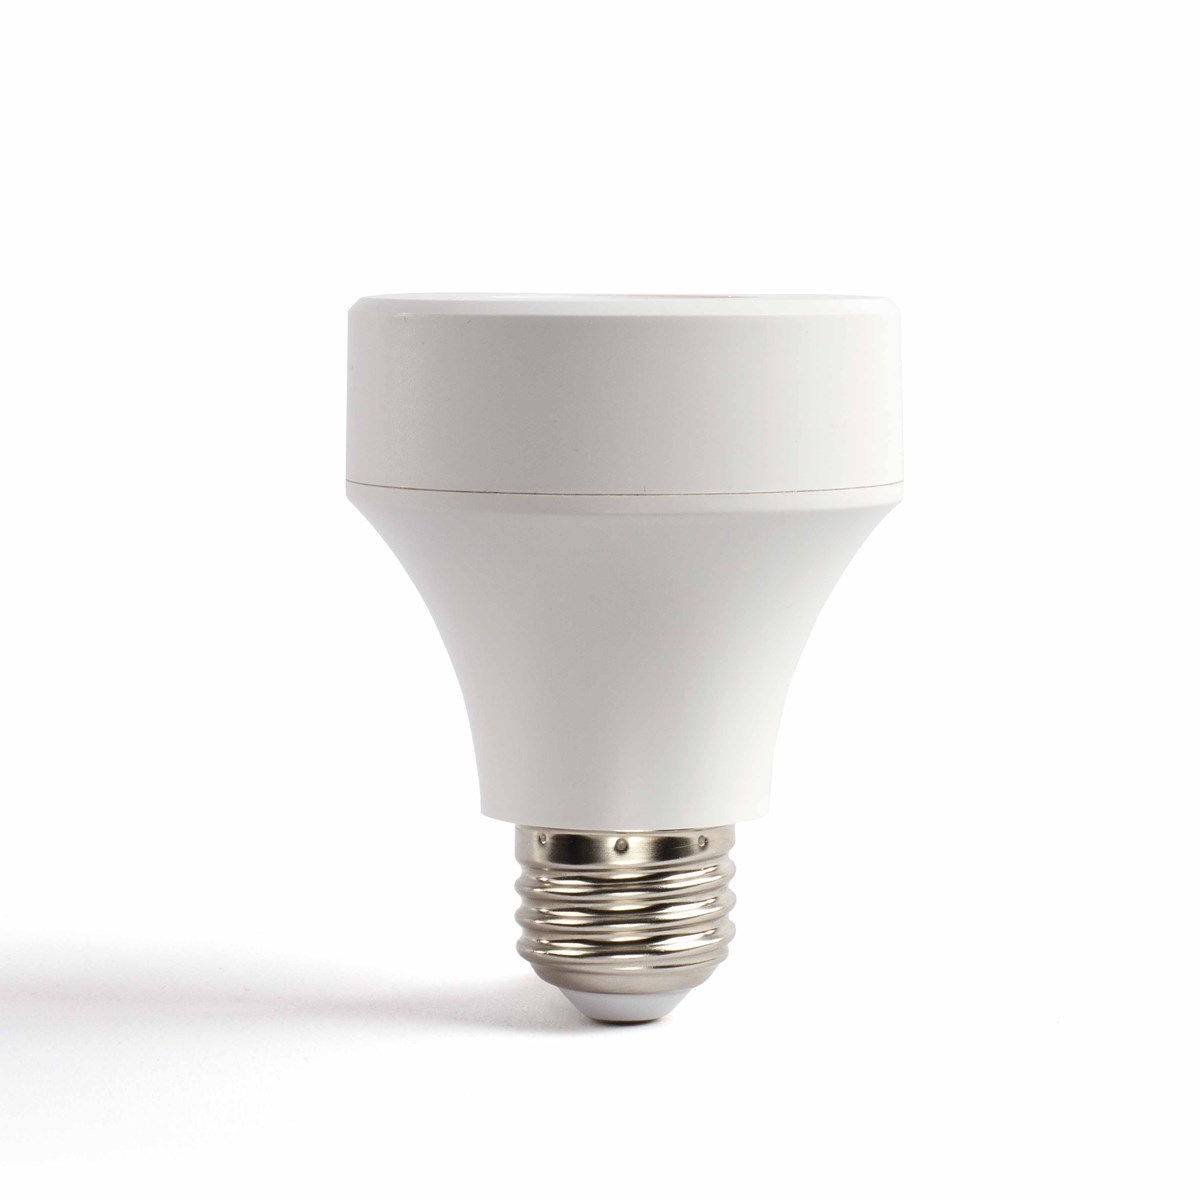 Douille d'ampoule Wifi en abs blanc